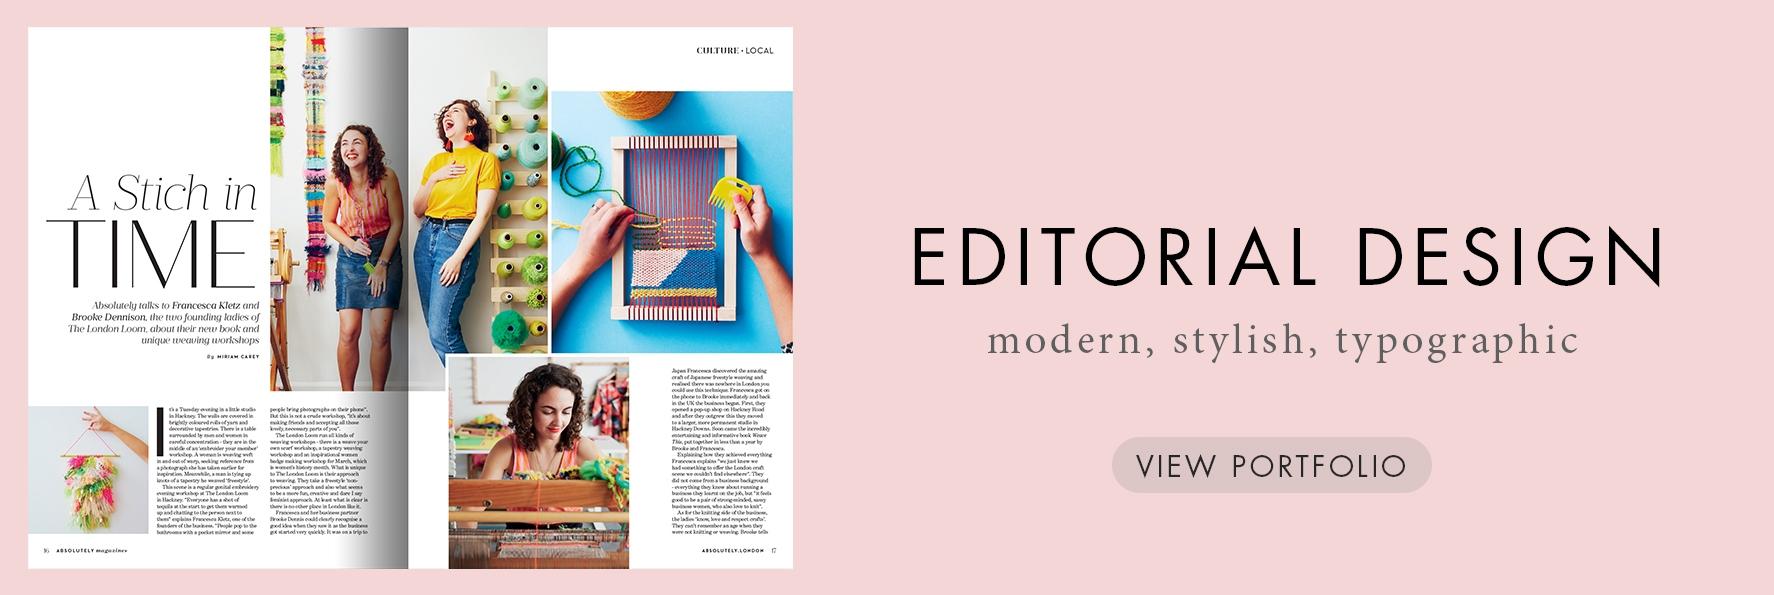 editorial_design_banner.jpg